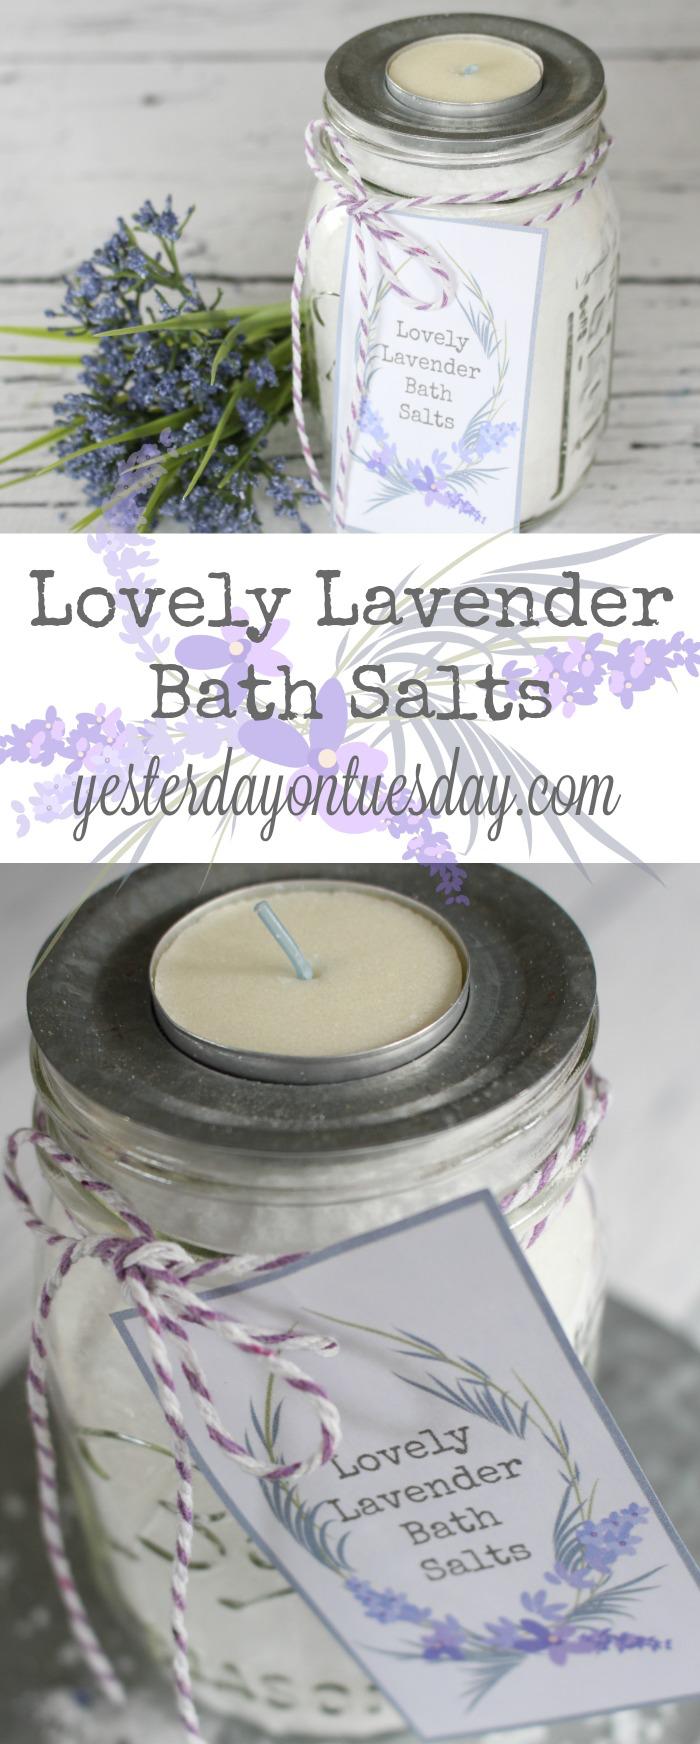 Lovely Lavender Bath Salts Yesterday On Tuesday Bath Salts Diy Bath Salts Gift Lavender Bath Salts